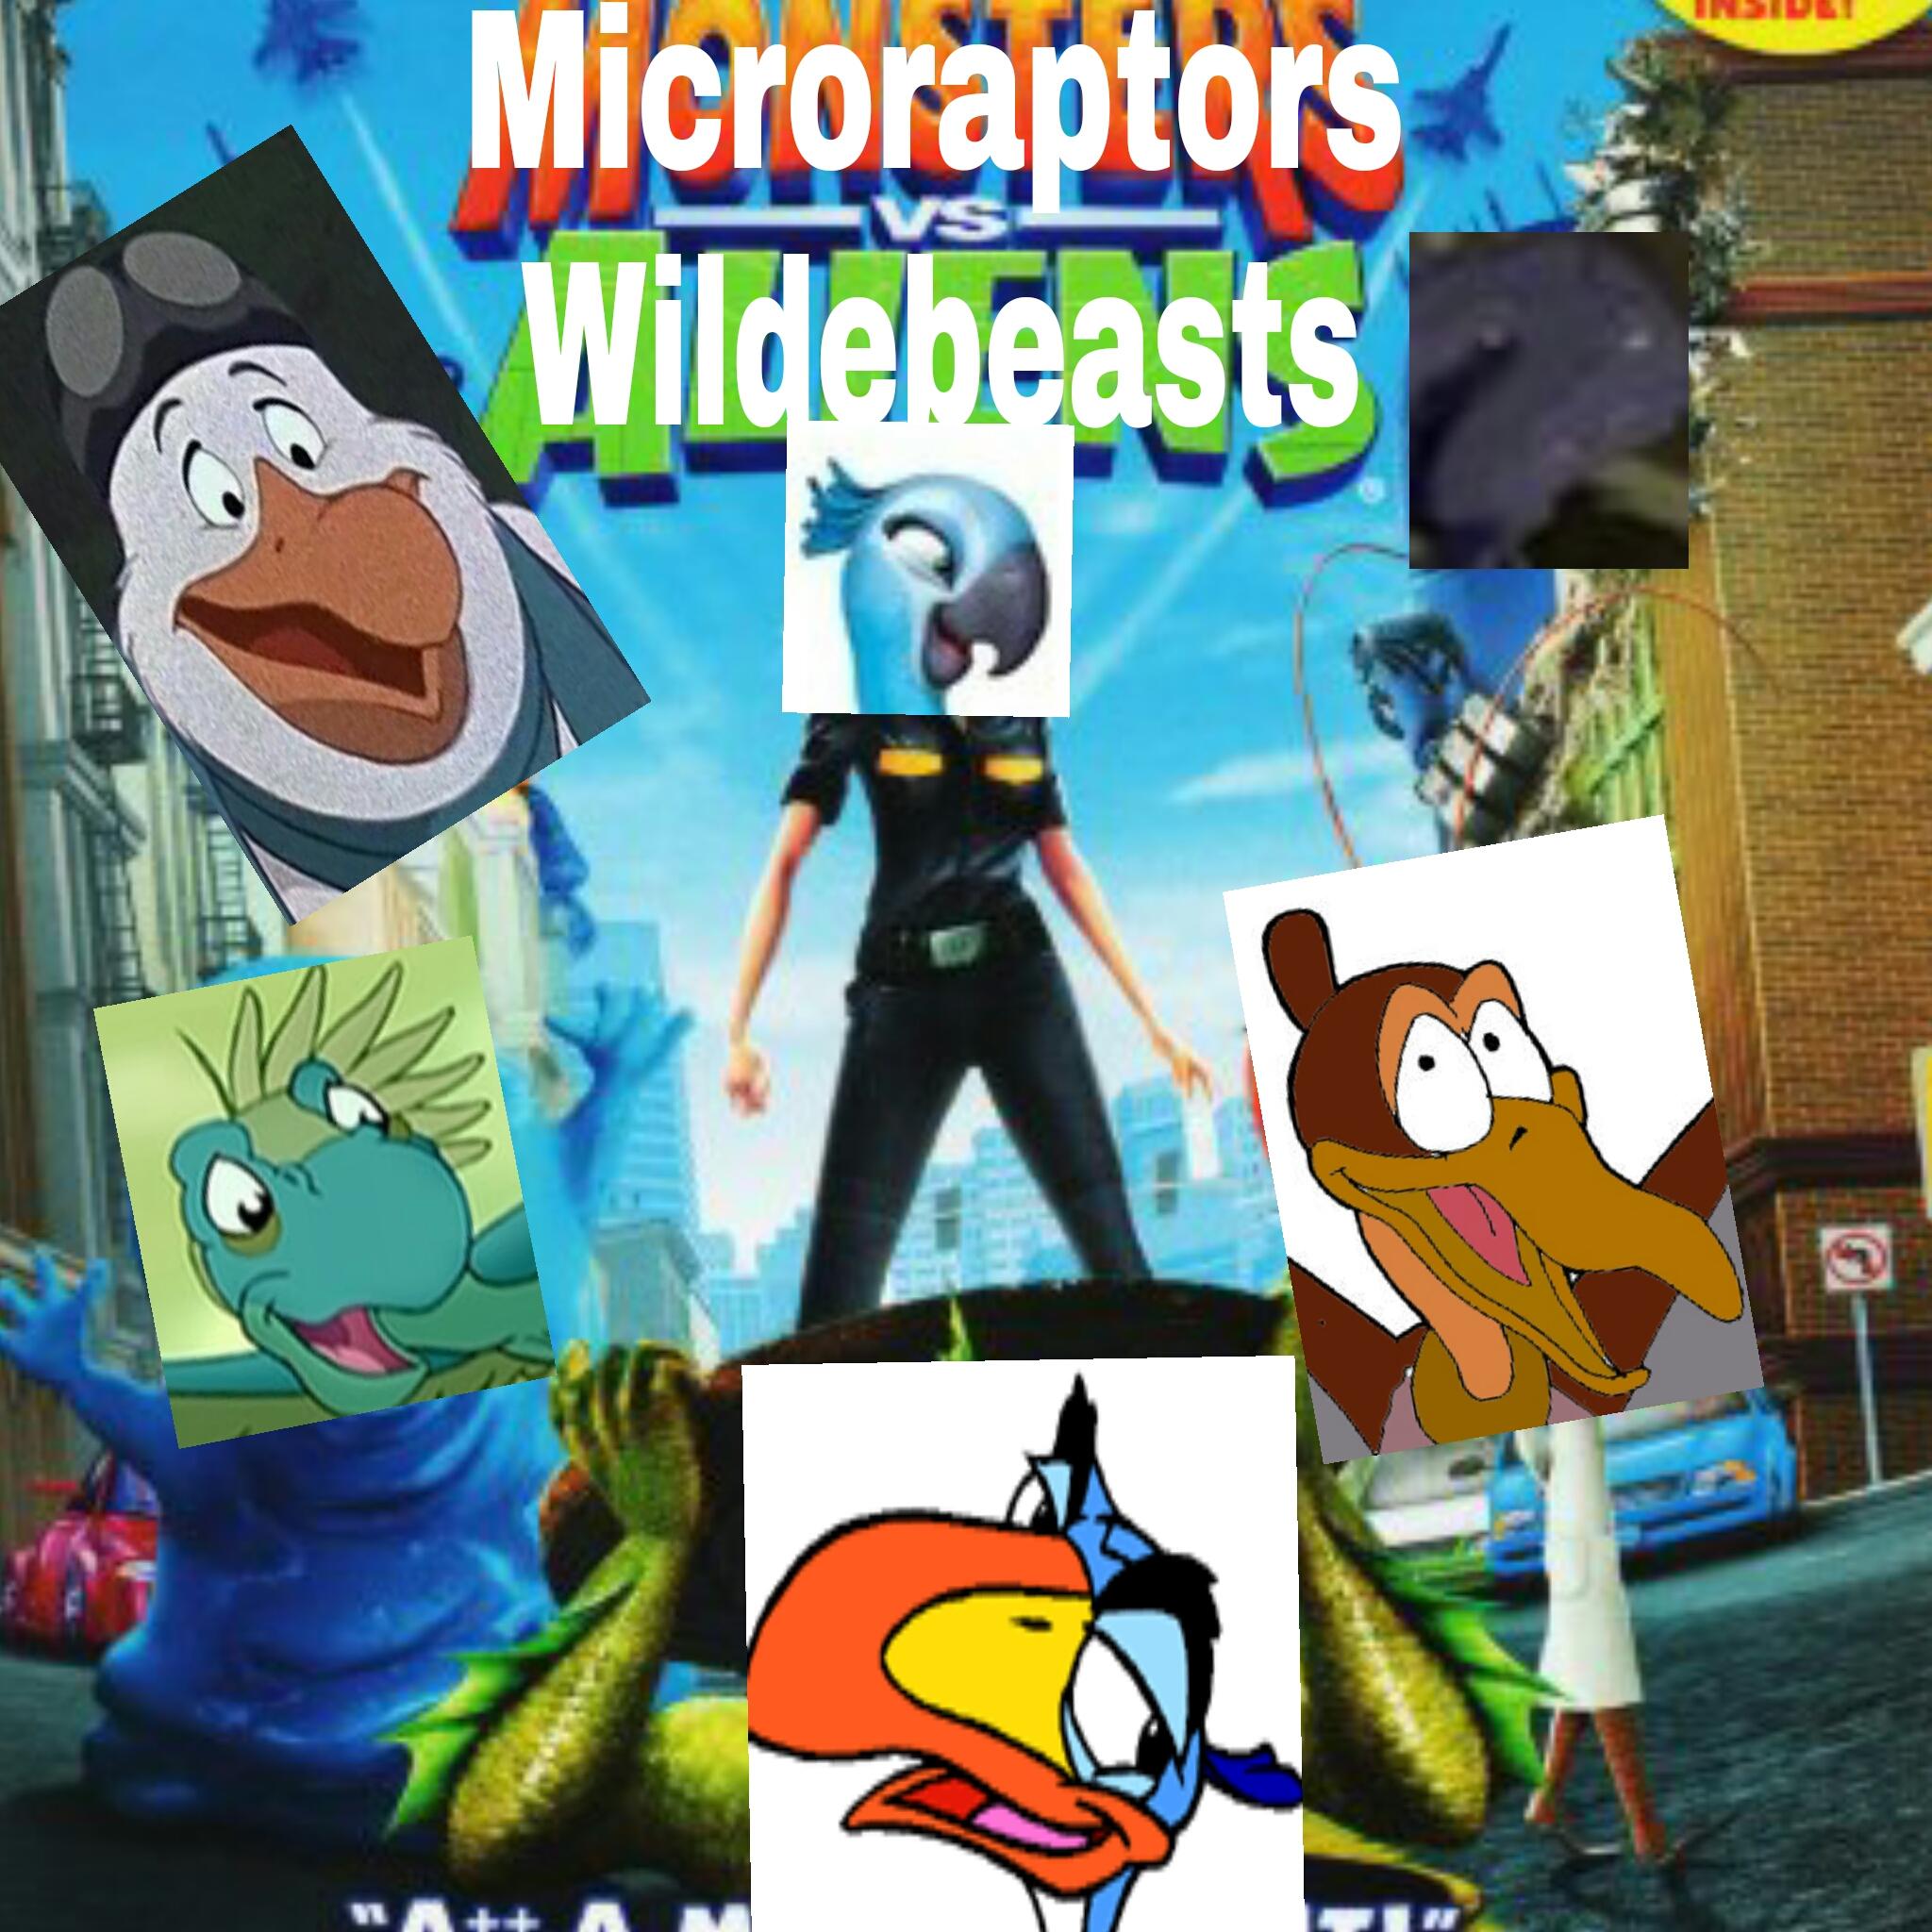 Microraptors vs. Wildebeests